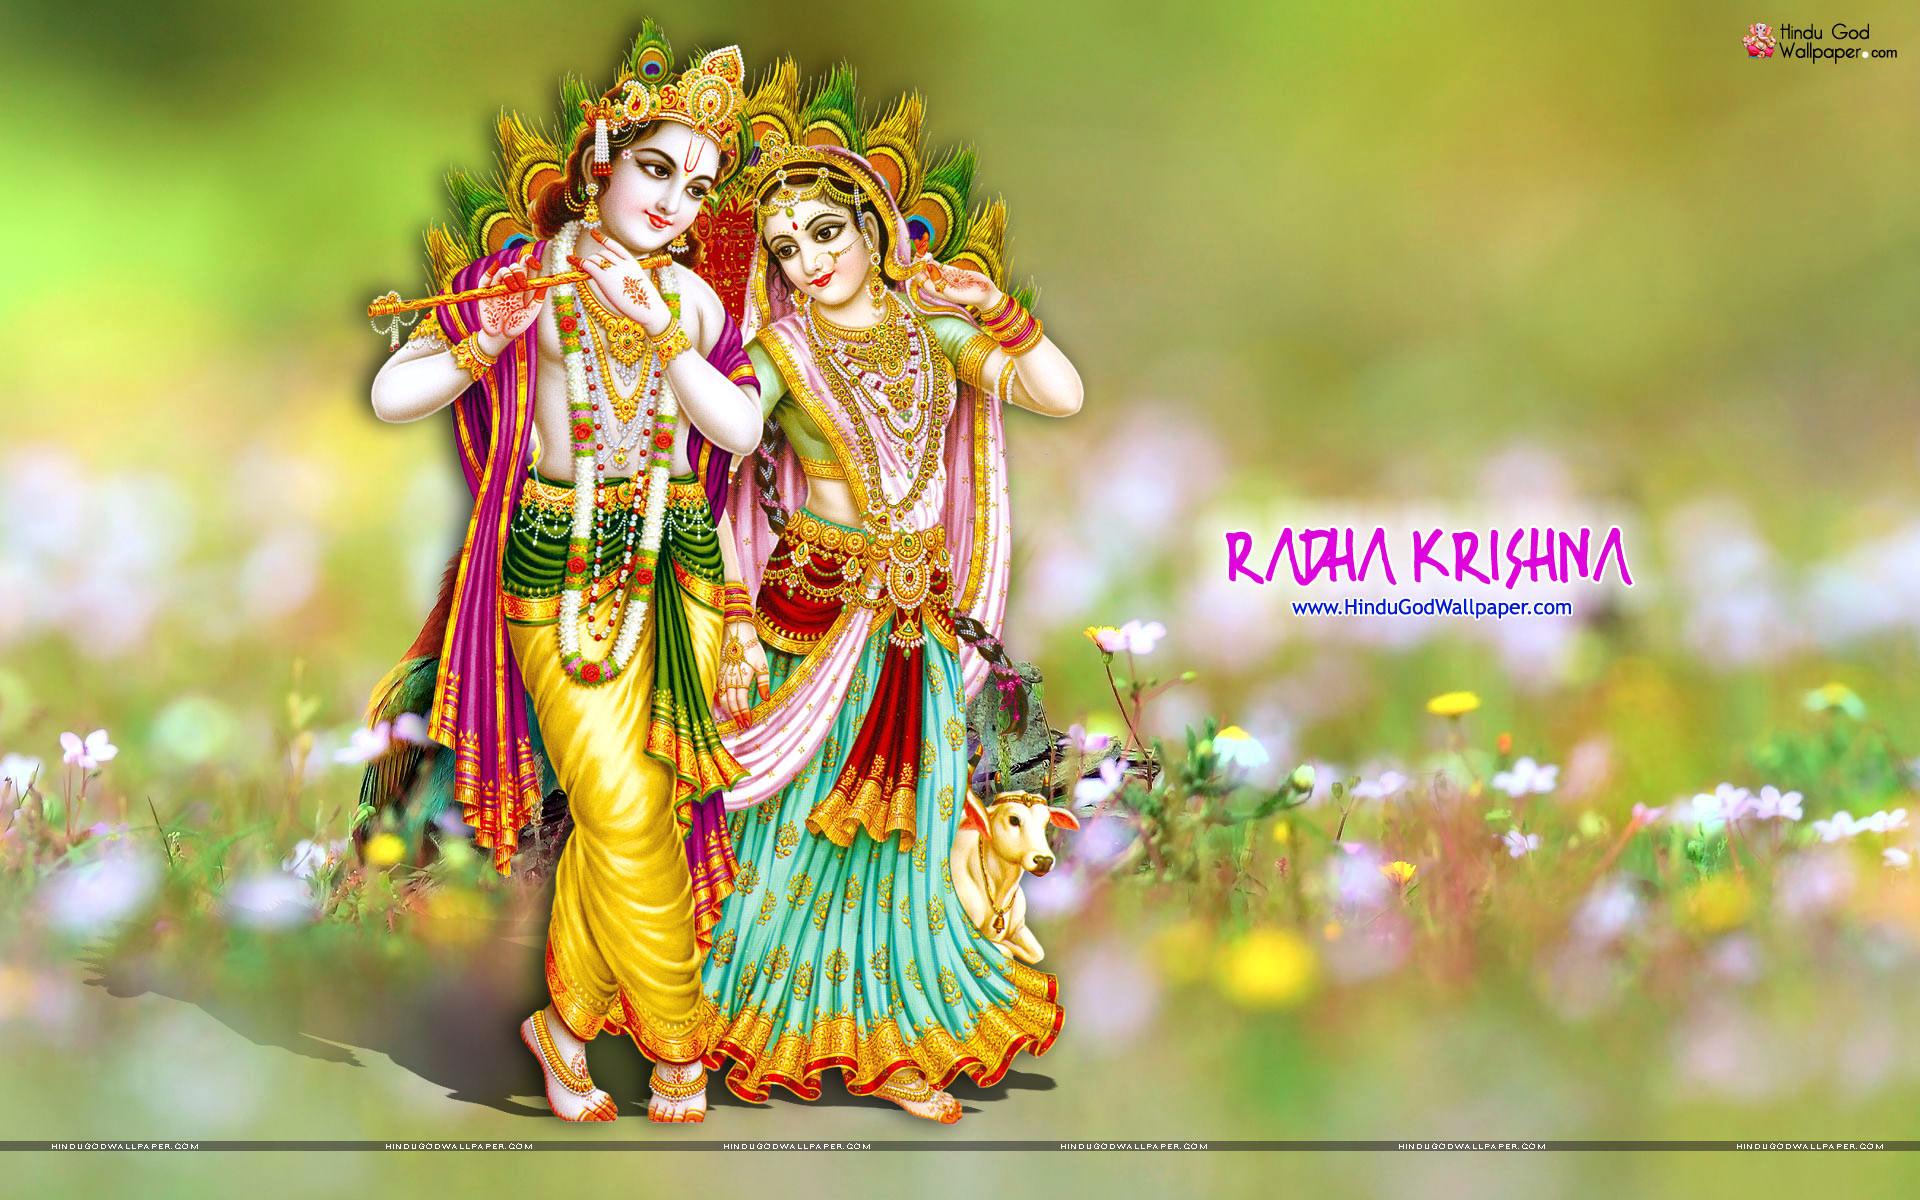 Radha krishna hd wallpaper jpg 295878